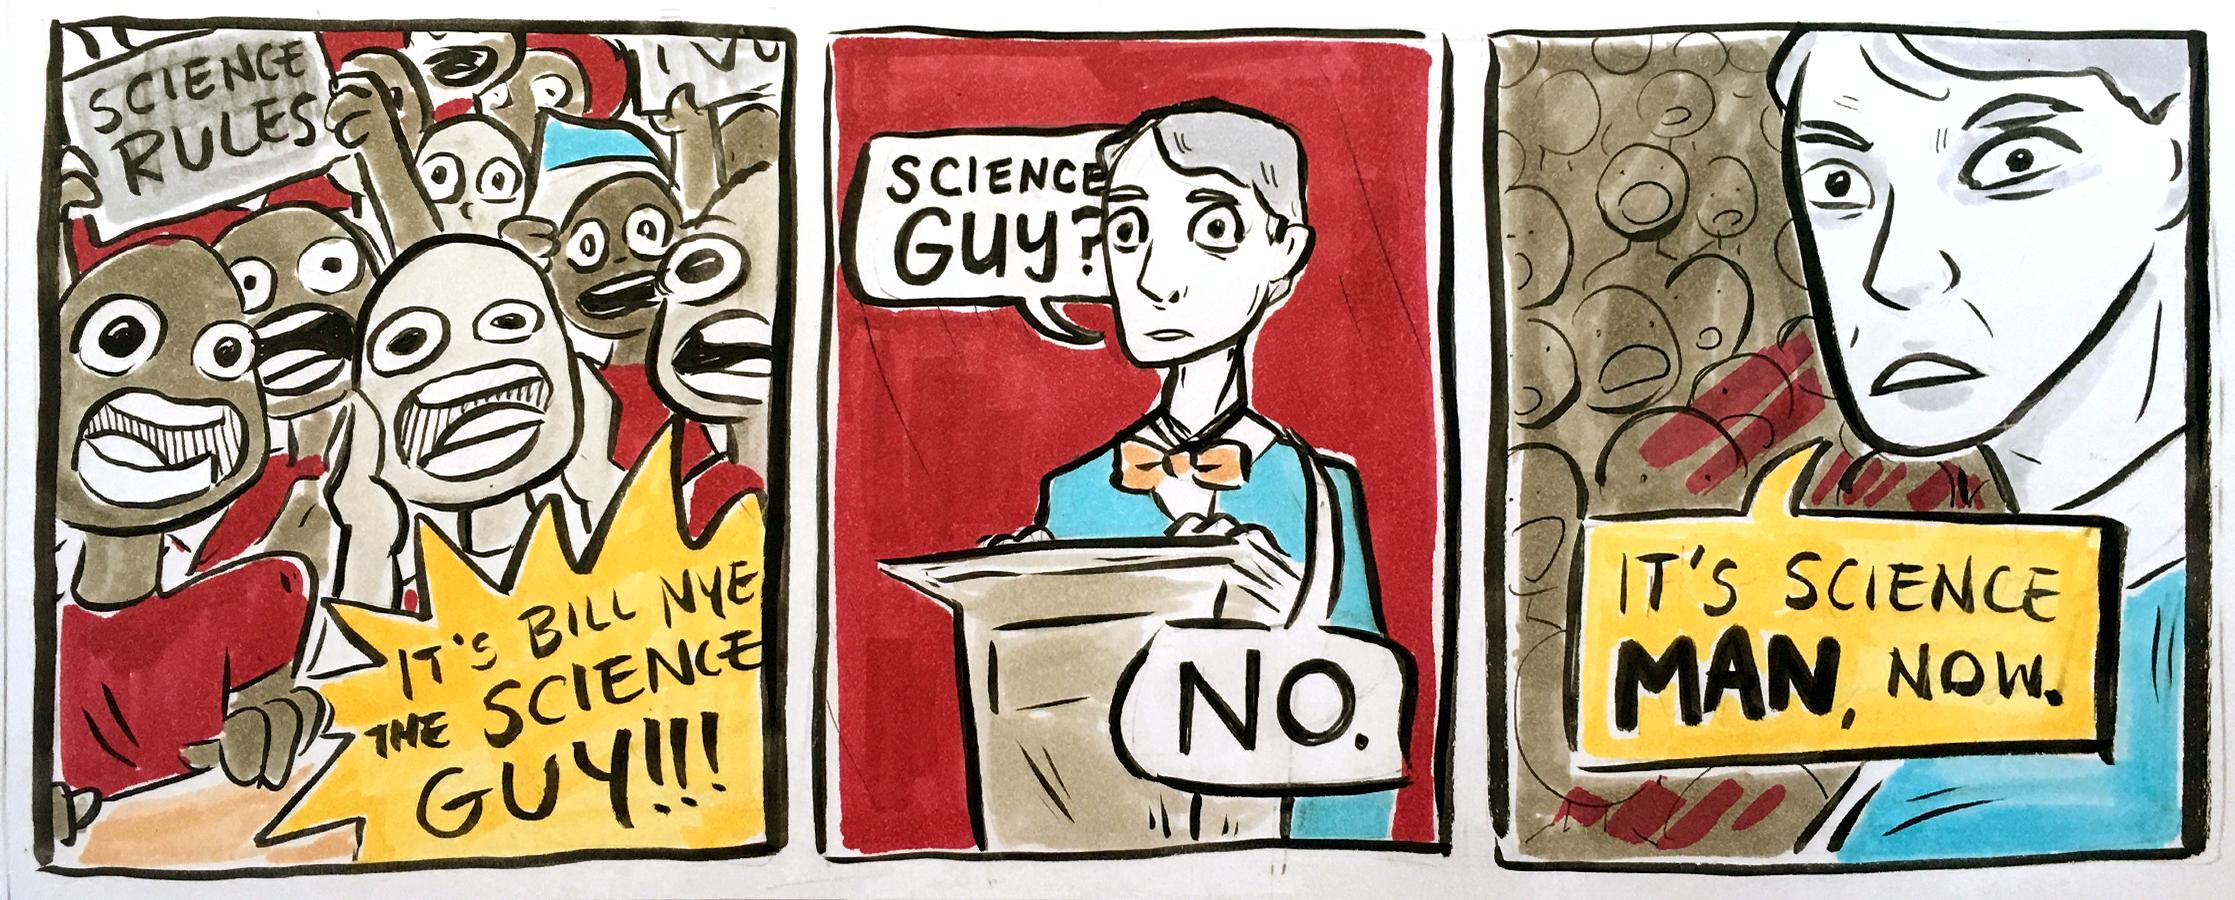 Science man